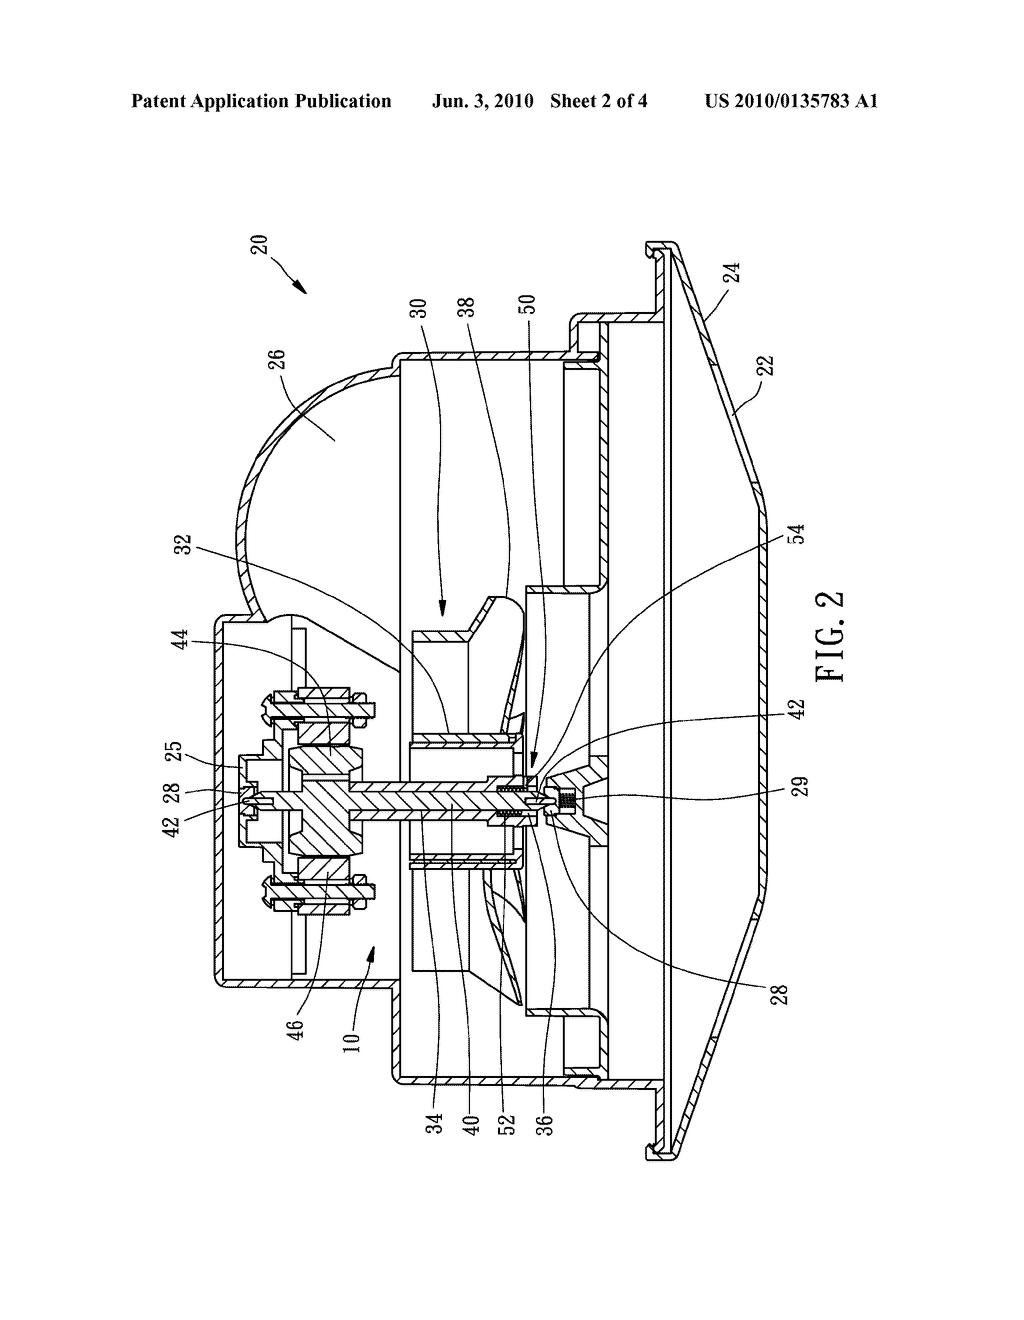 Broan Attic Fan Wiring Diagram Auto Electrical